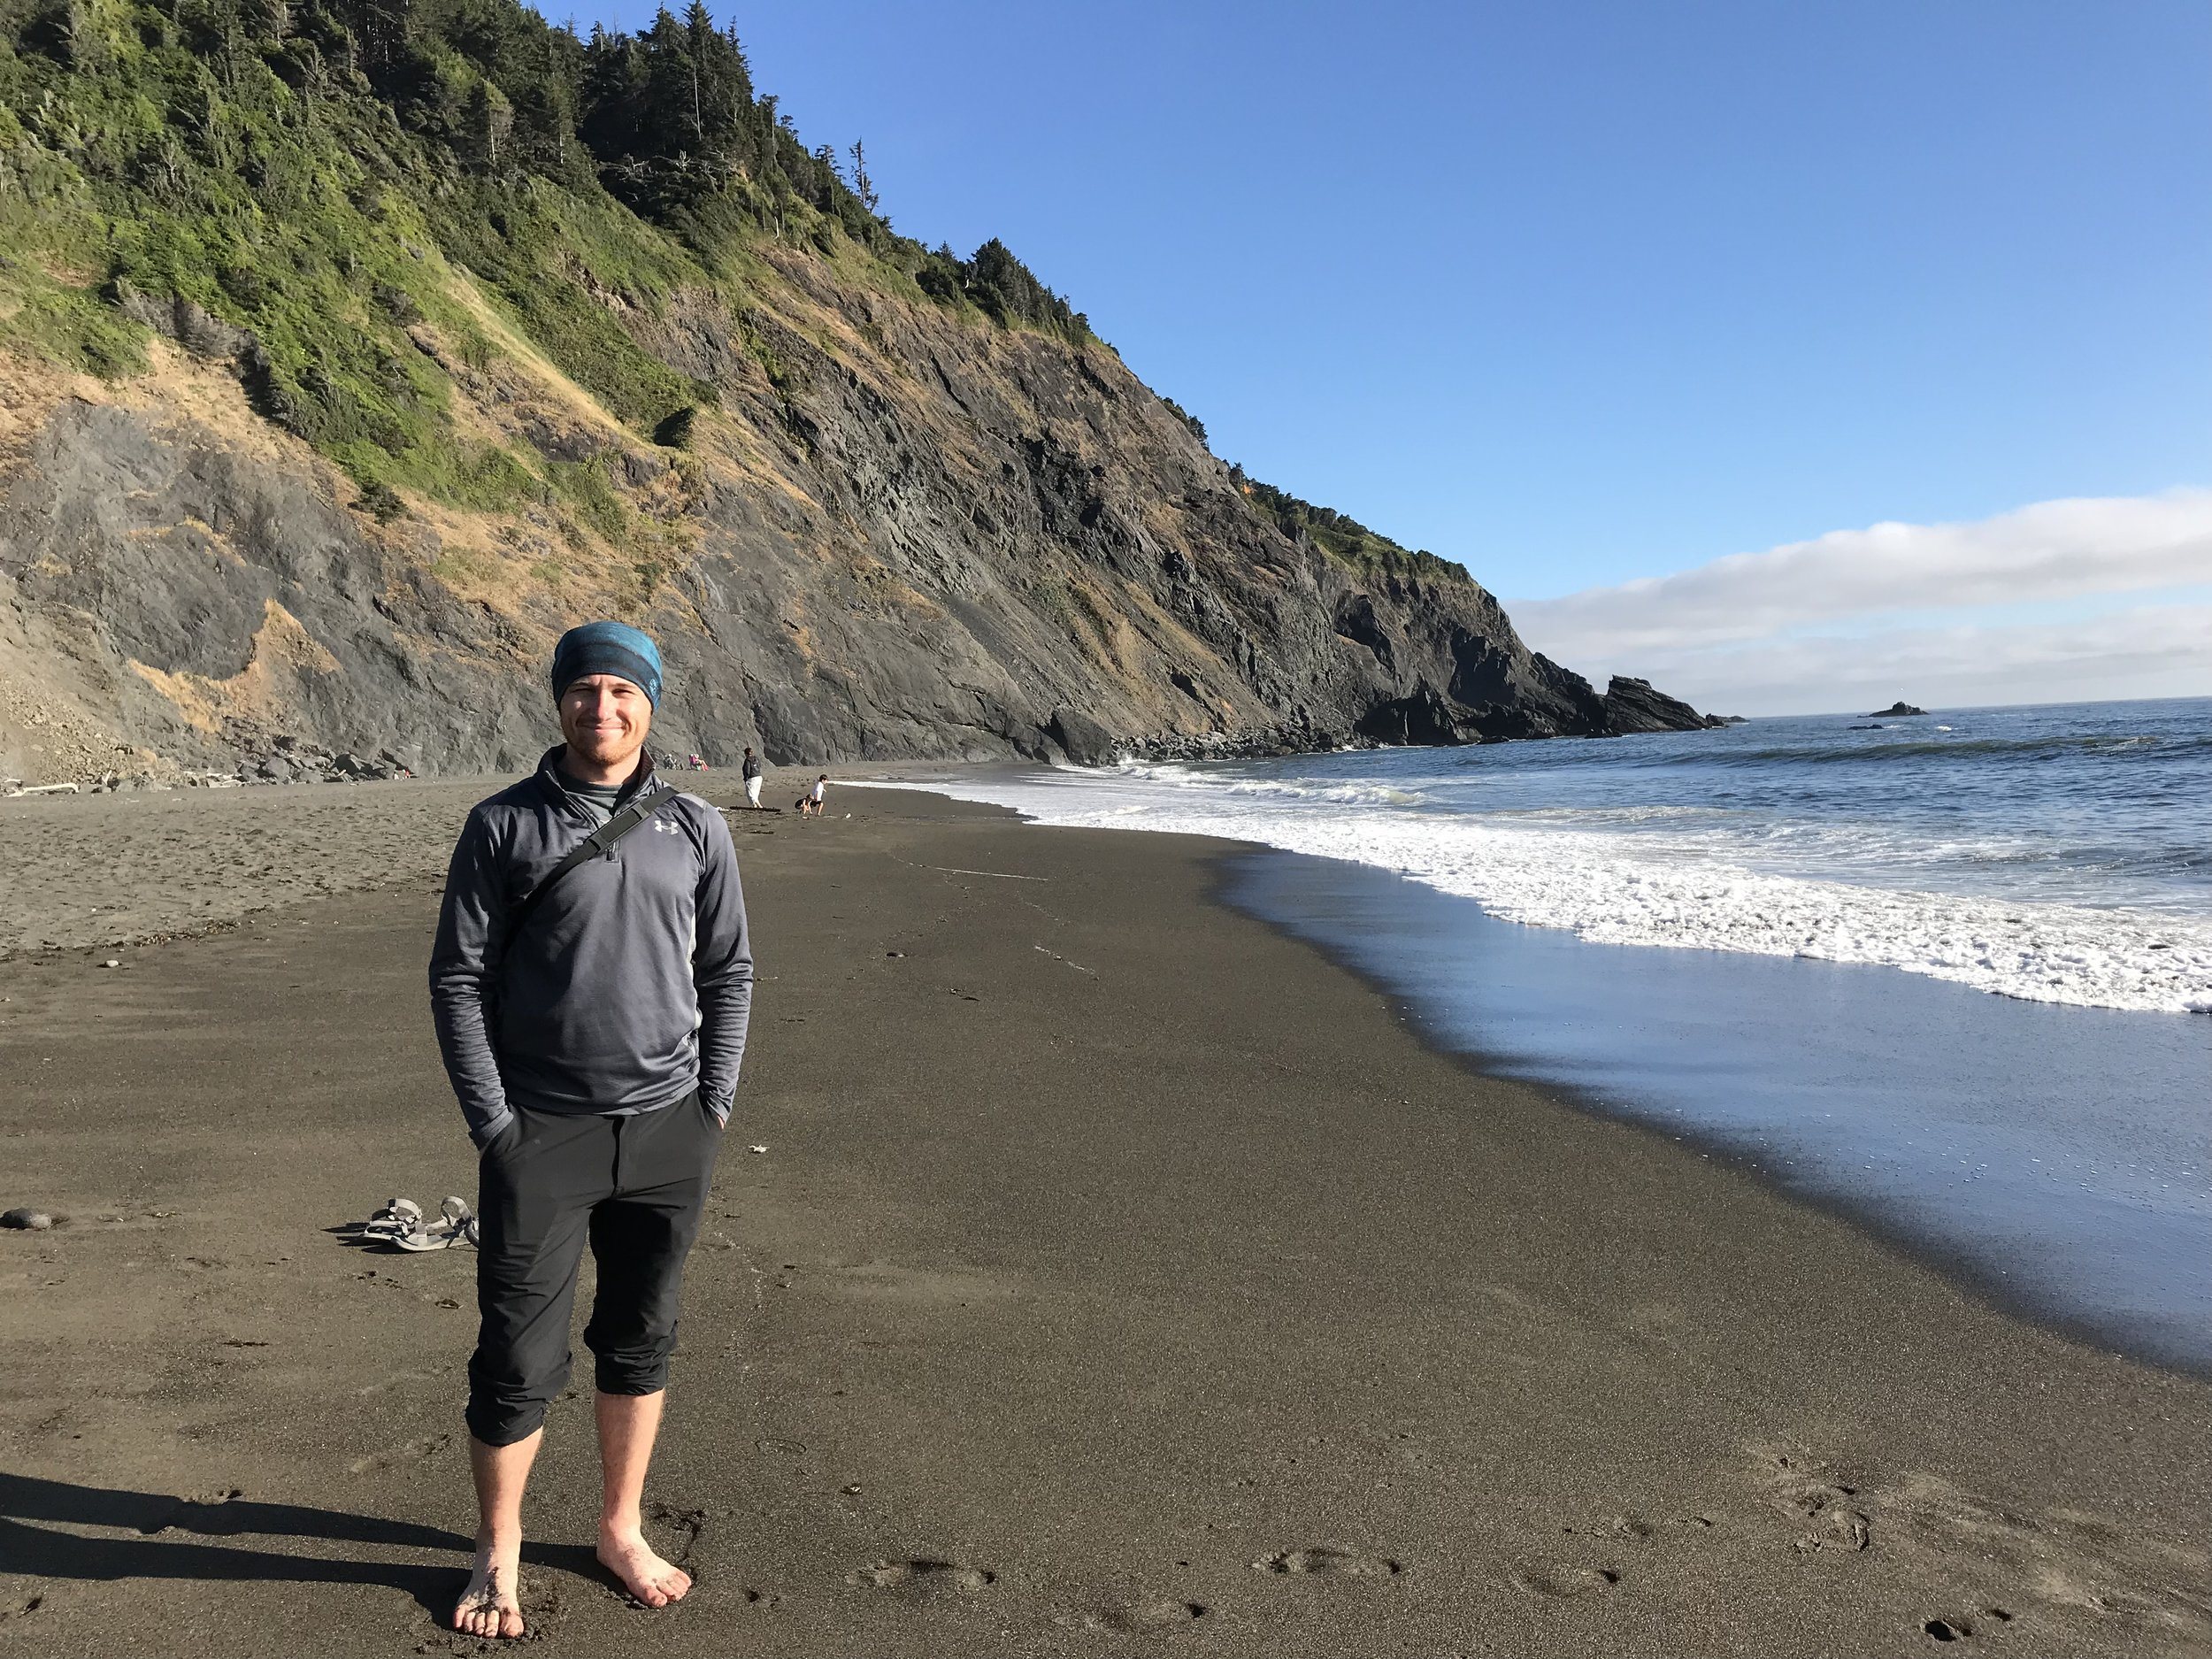 Beach at Humbug Mountain